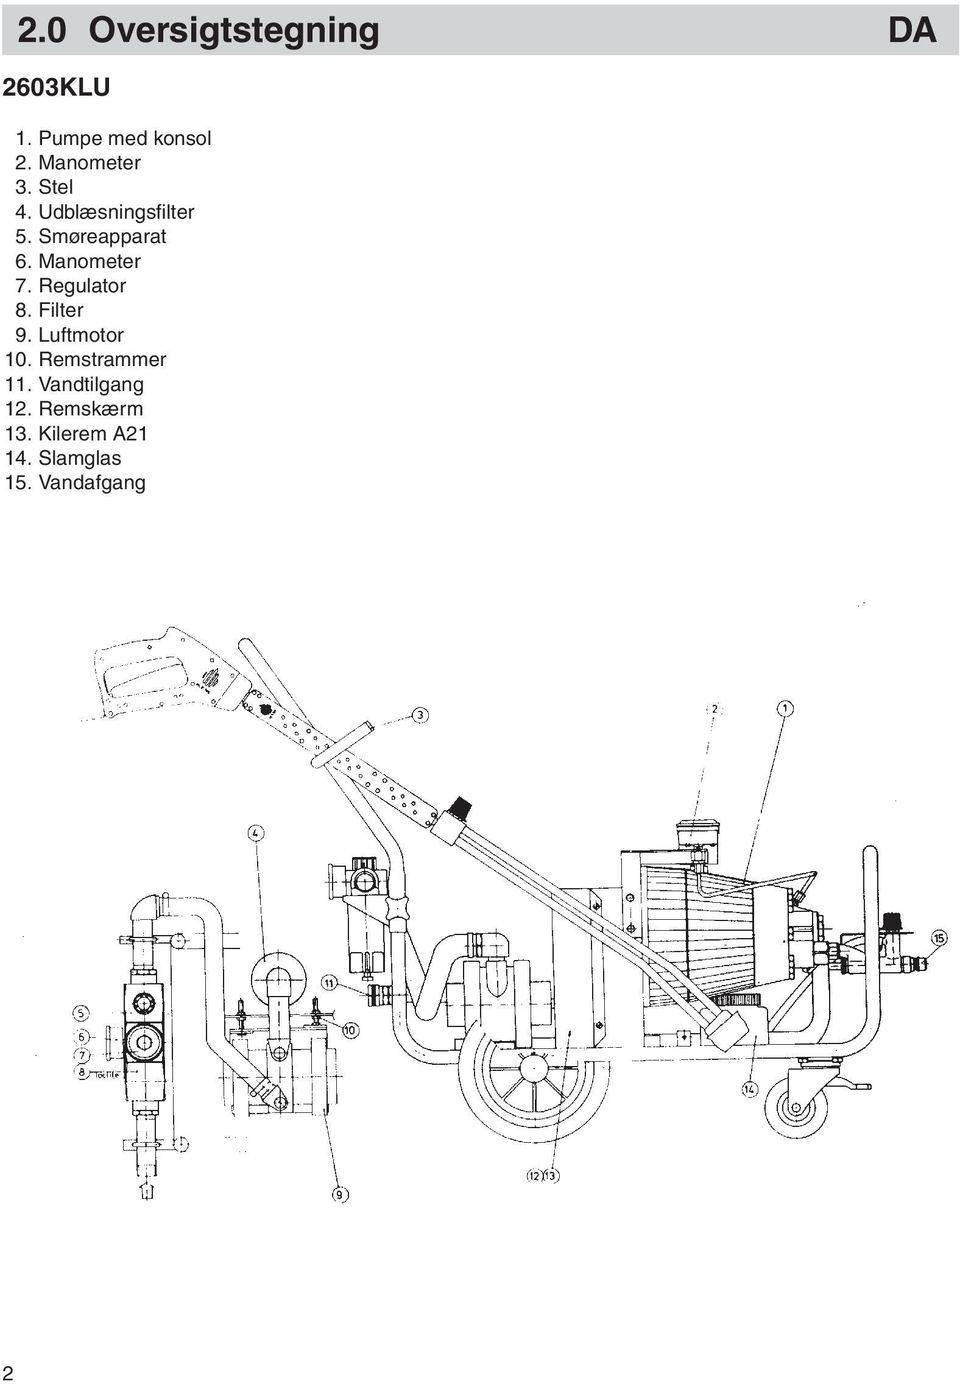 Honda Cbr 125 Manual Pdf Download. Kostenlose Computer im